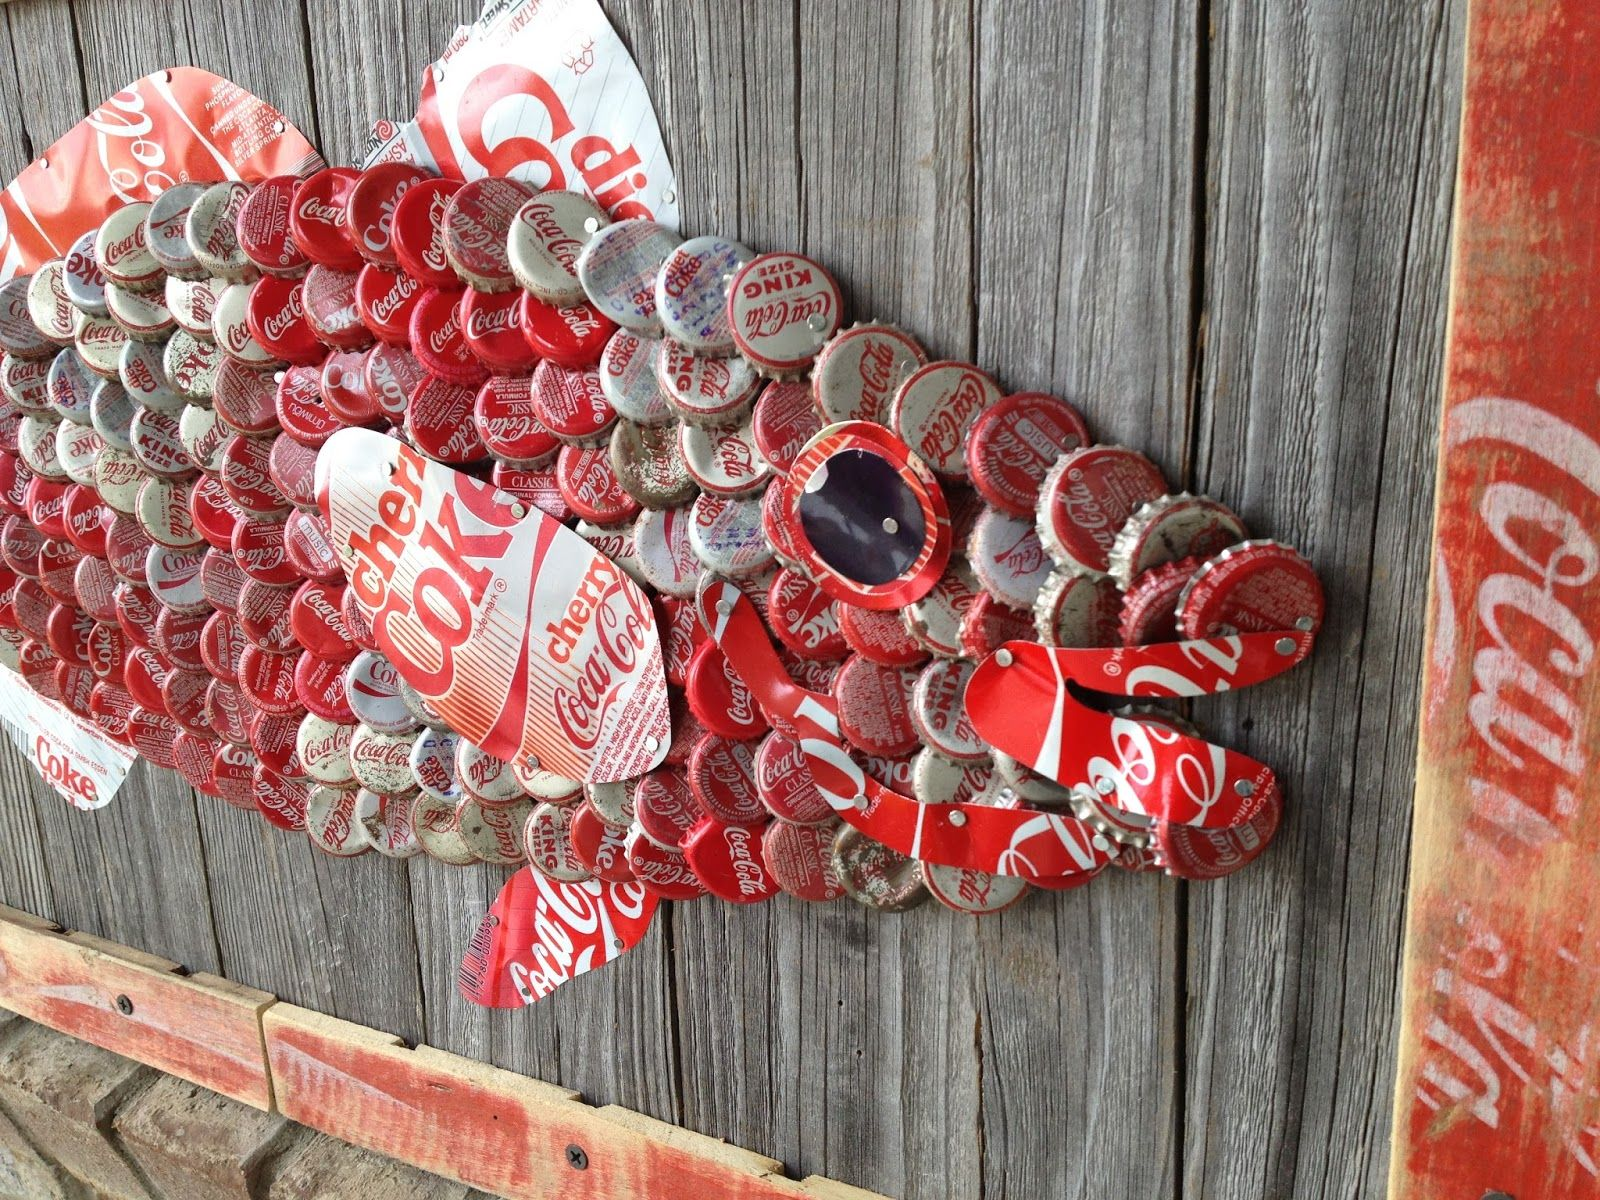 More Art From The Hot Florida Sun Mexican Sea Project Beer Cap Art Bottle Cap Art Bottle Cap Crafts